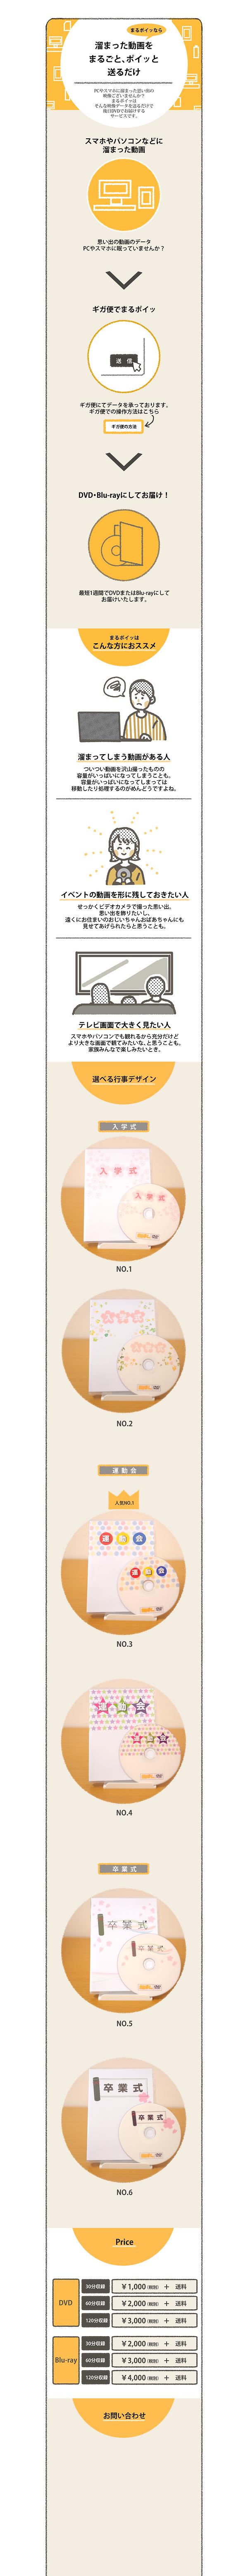 LPデザイン_スマホ用_1 (1).png